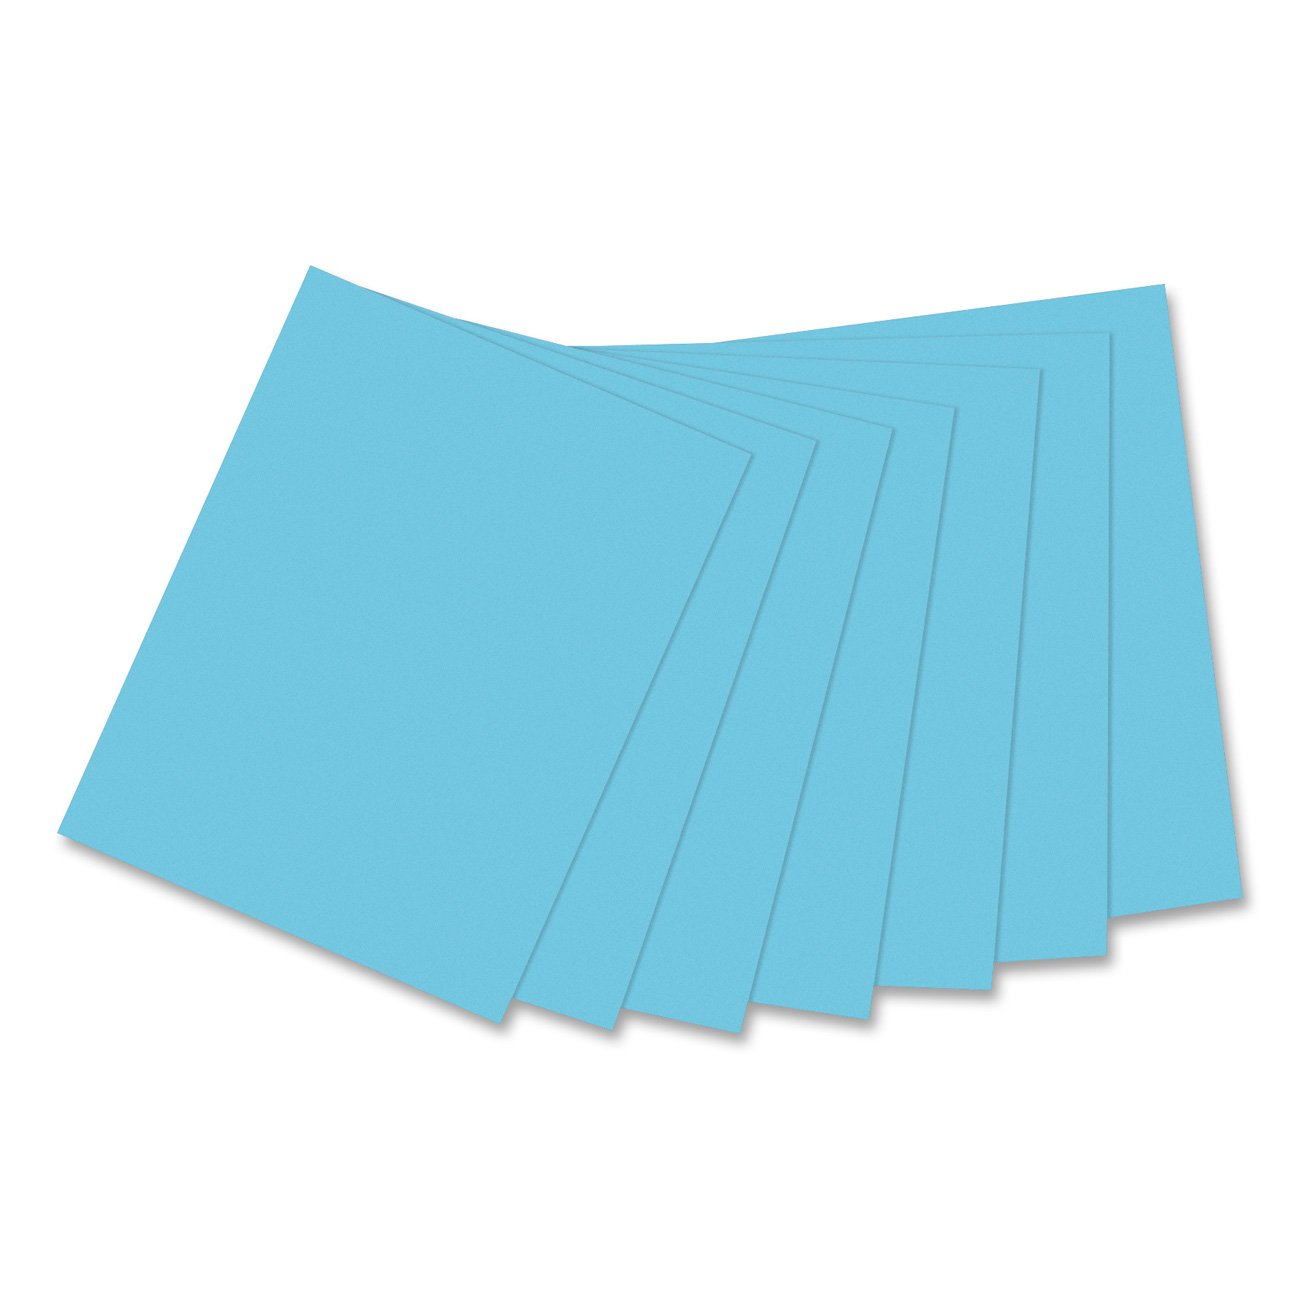 "Kaleidoscope Multi-Purpose Paper, 8 1/2""X11"", Turquoise 500 Sheets"